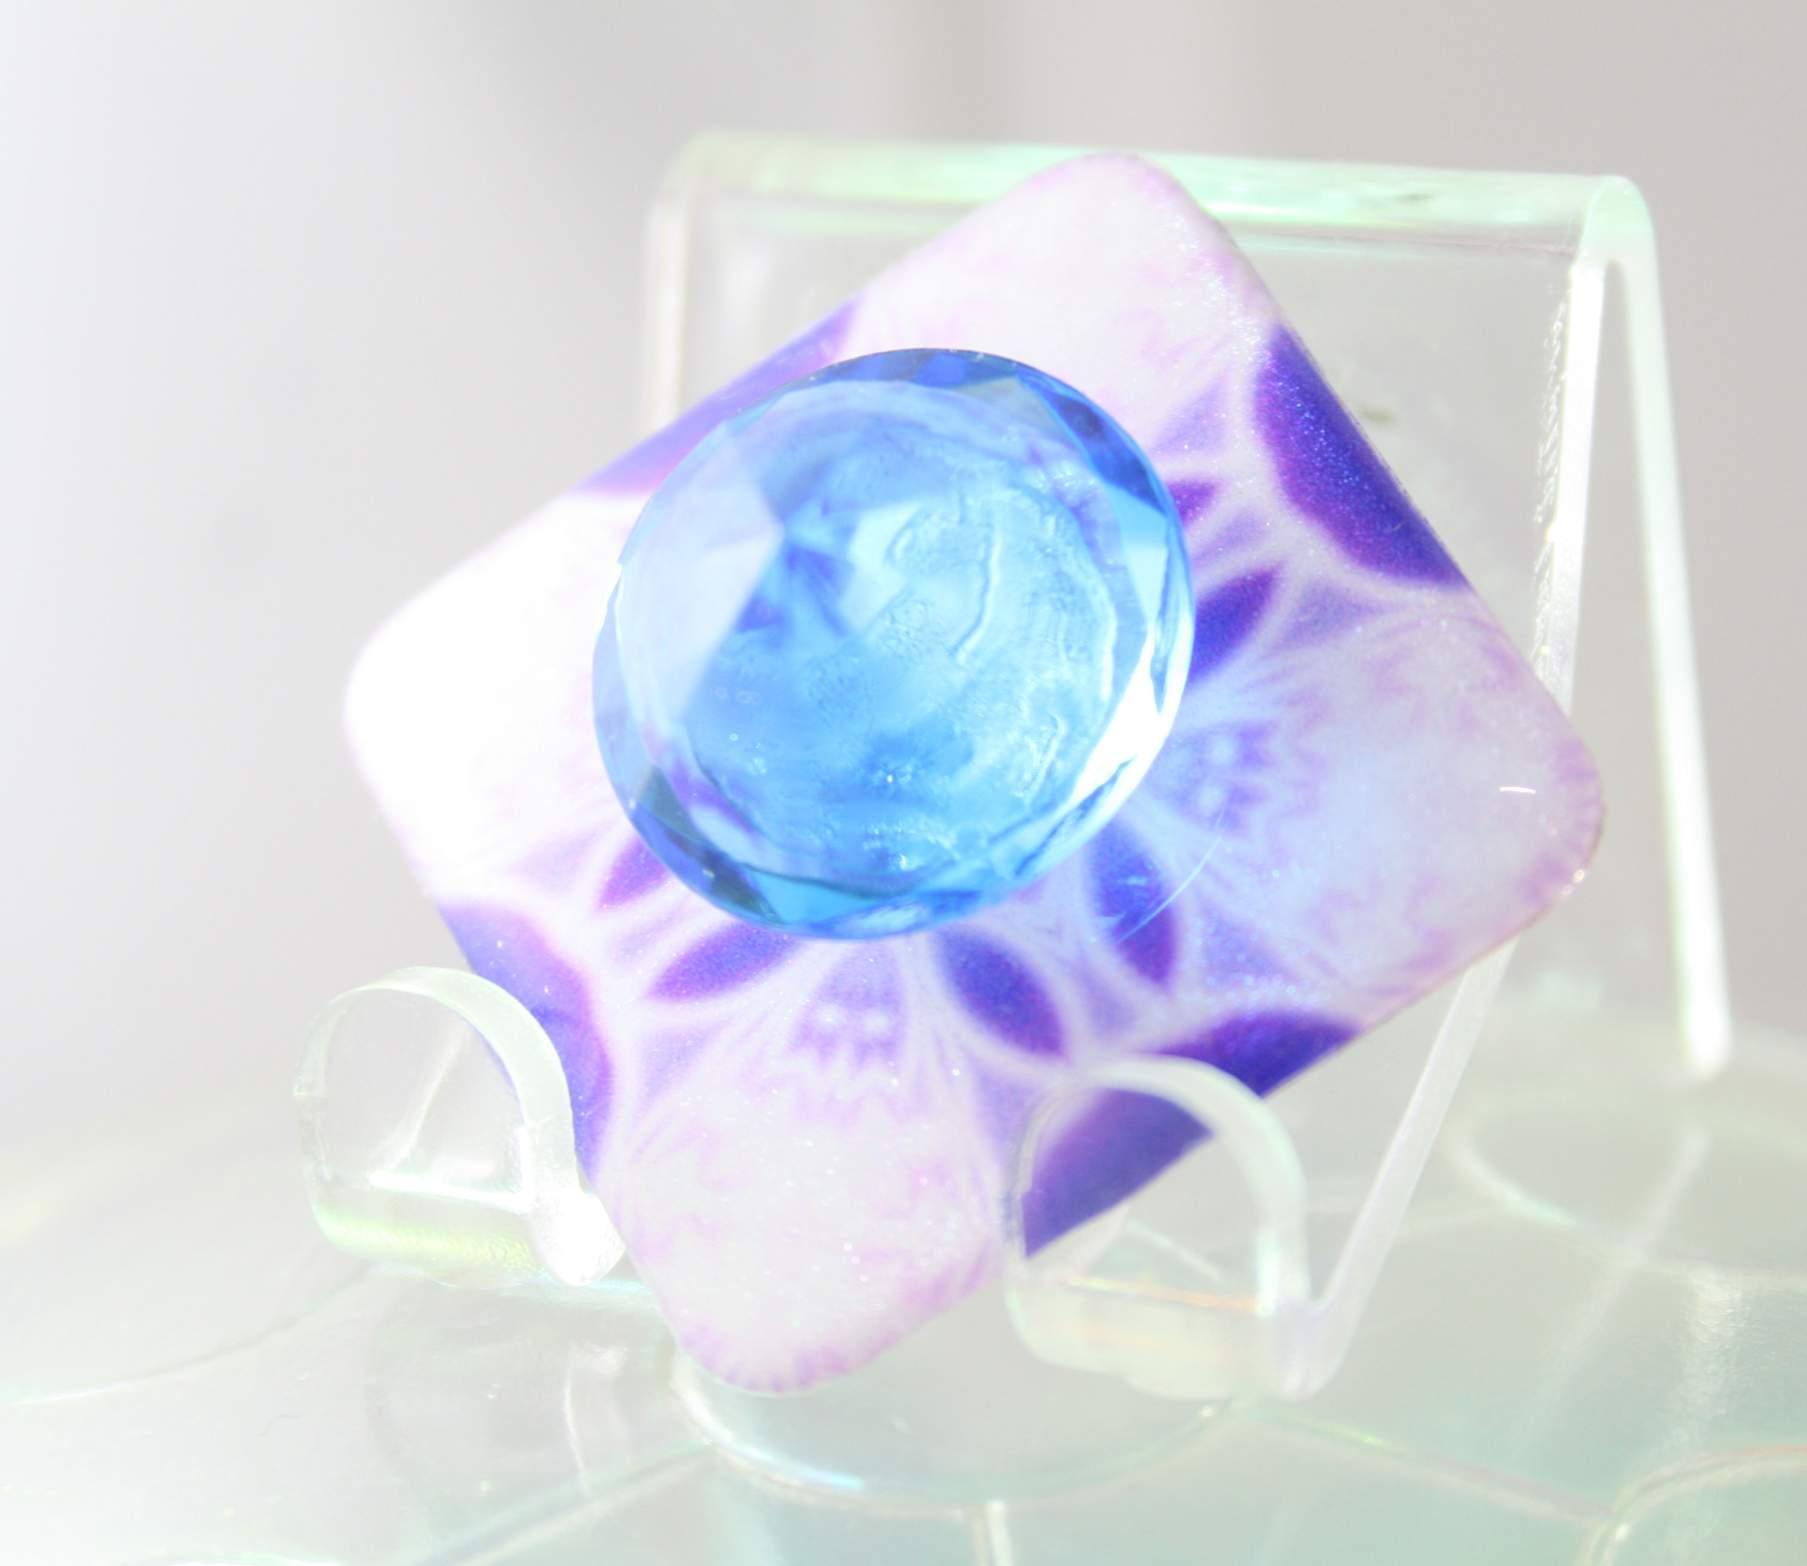 vanguard_v01-singleflat-blue04